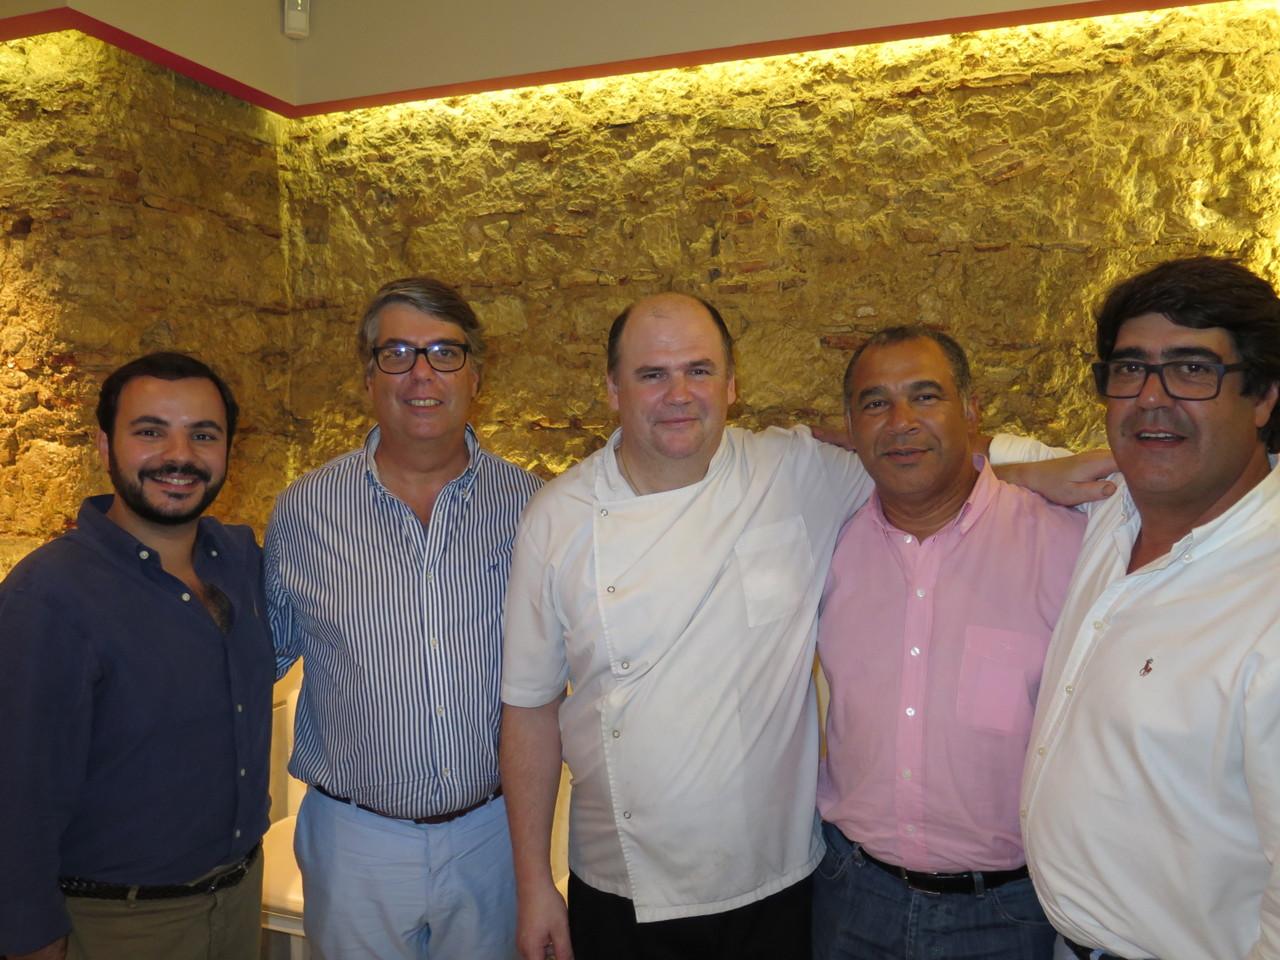 João Jorge, João Alegre, Walter Blazevic, Osvaldo Amado, Pedro Alegre